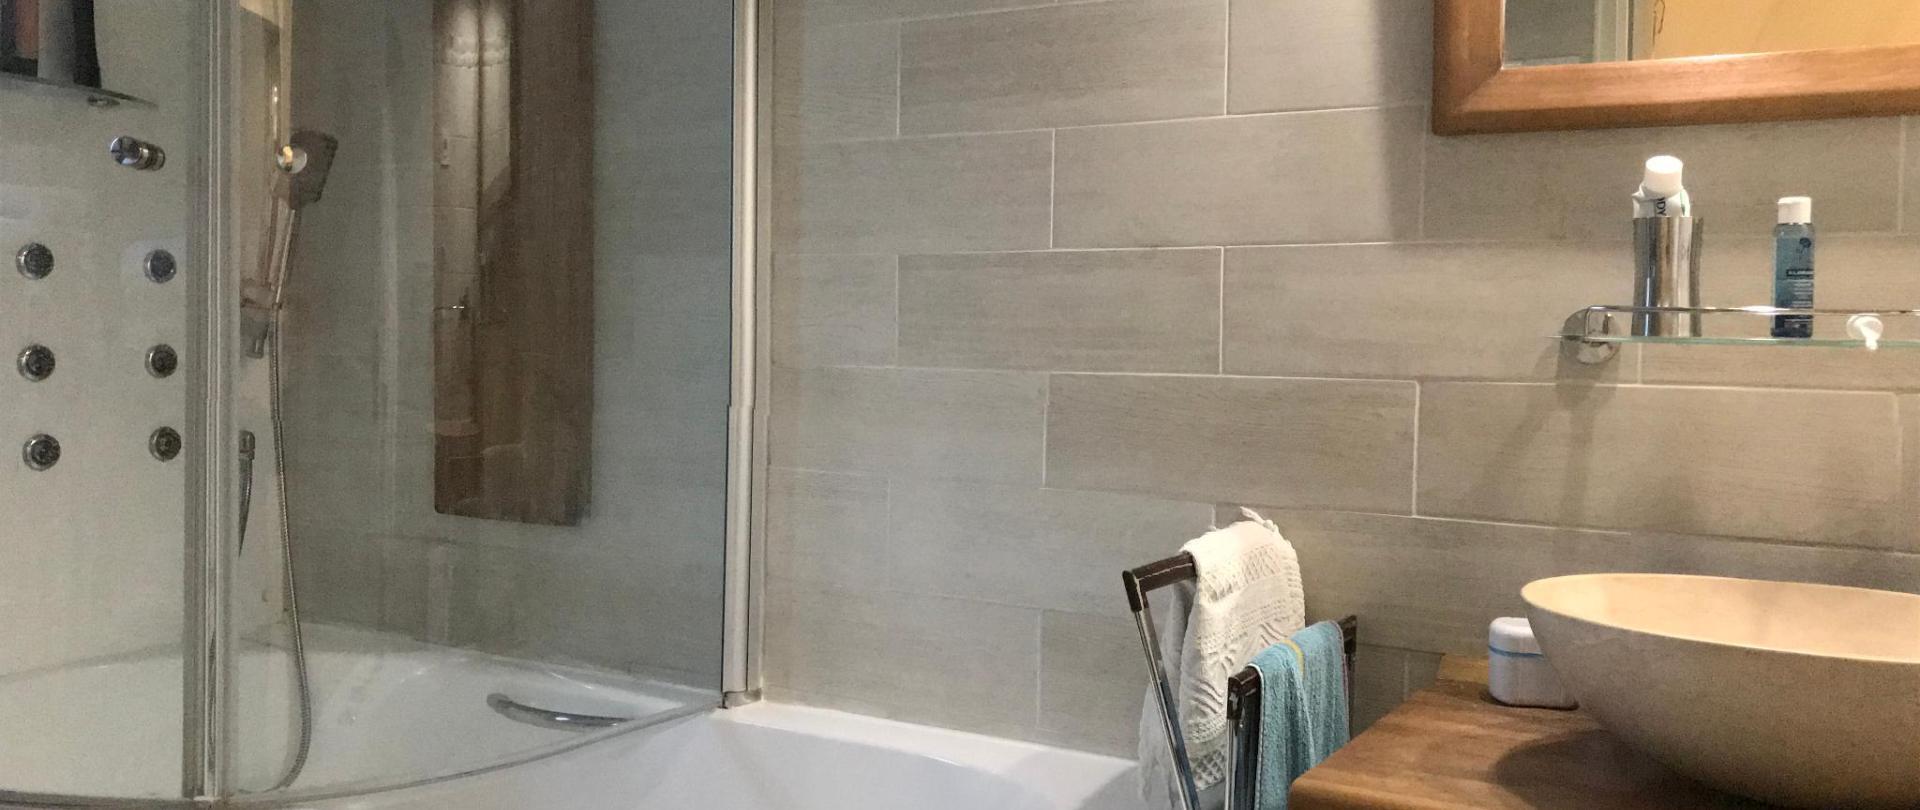 Salle de bain indépendante IMG_3625.jpg